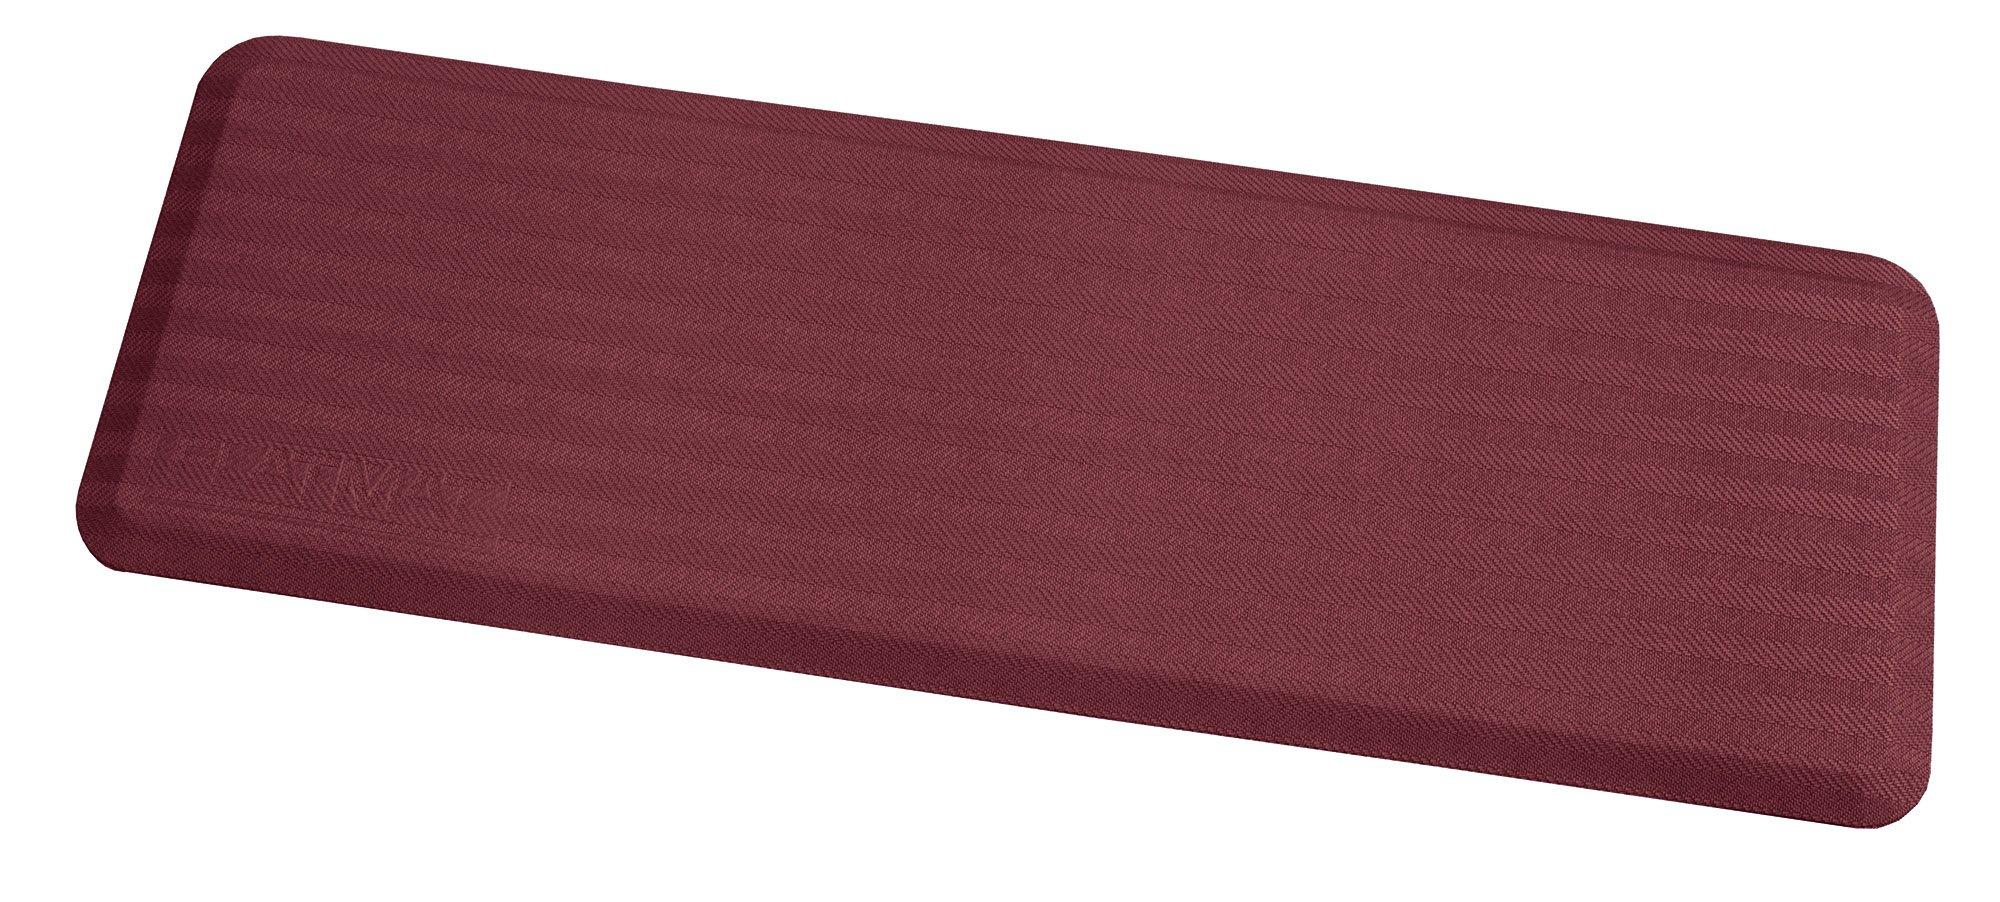 Arrowhead Healthcare Supply P-107350-36-06 FLATMAT, 36'' Wide, Bedside Fall Mat, Burgundy, Woven Pattern